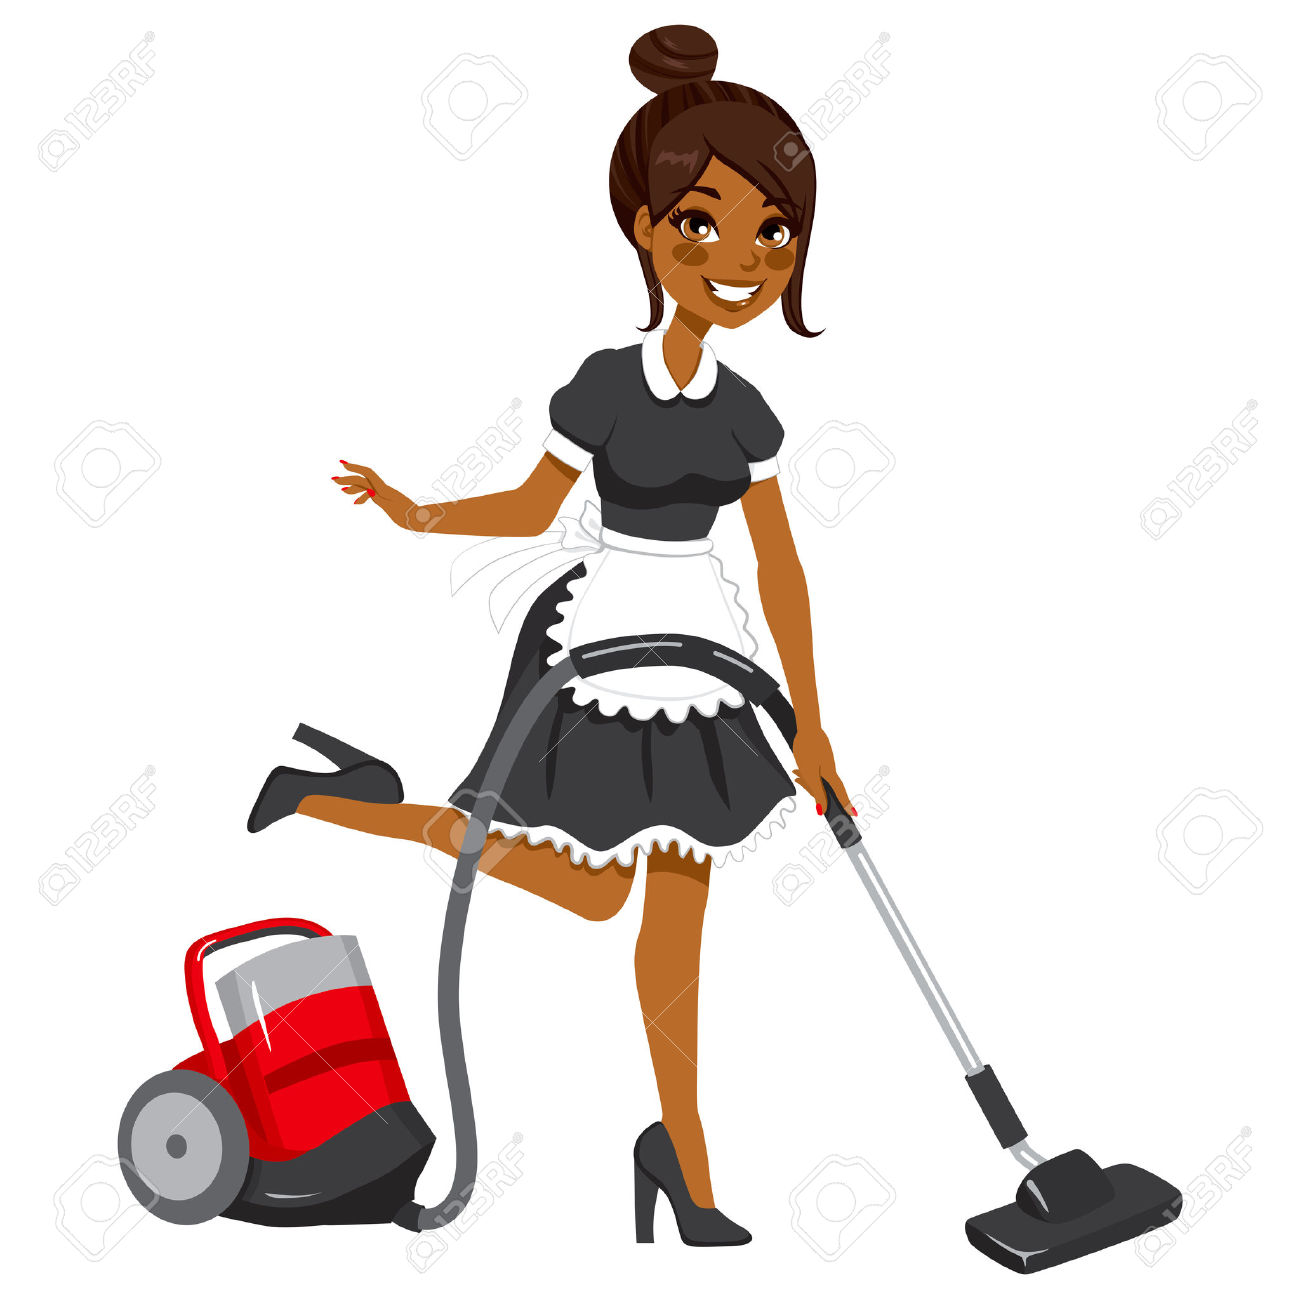 Maids free download best. Maid clipart cartoon